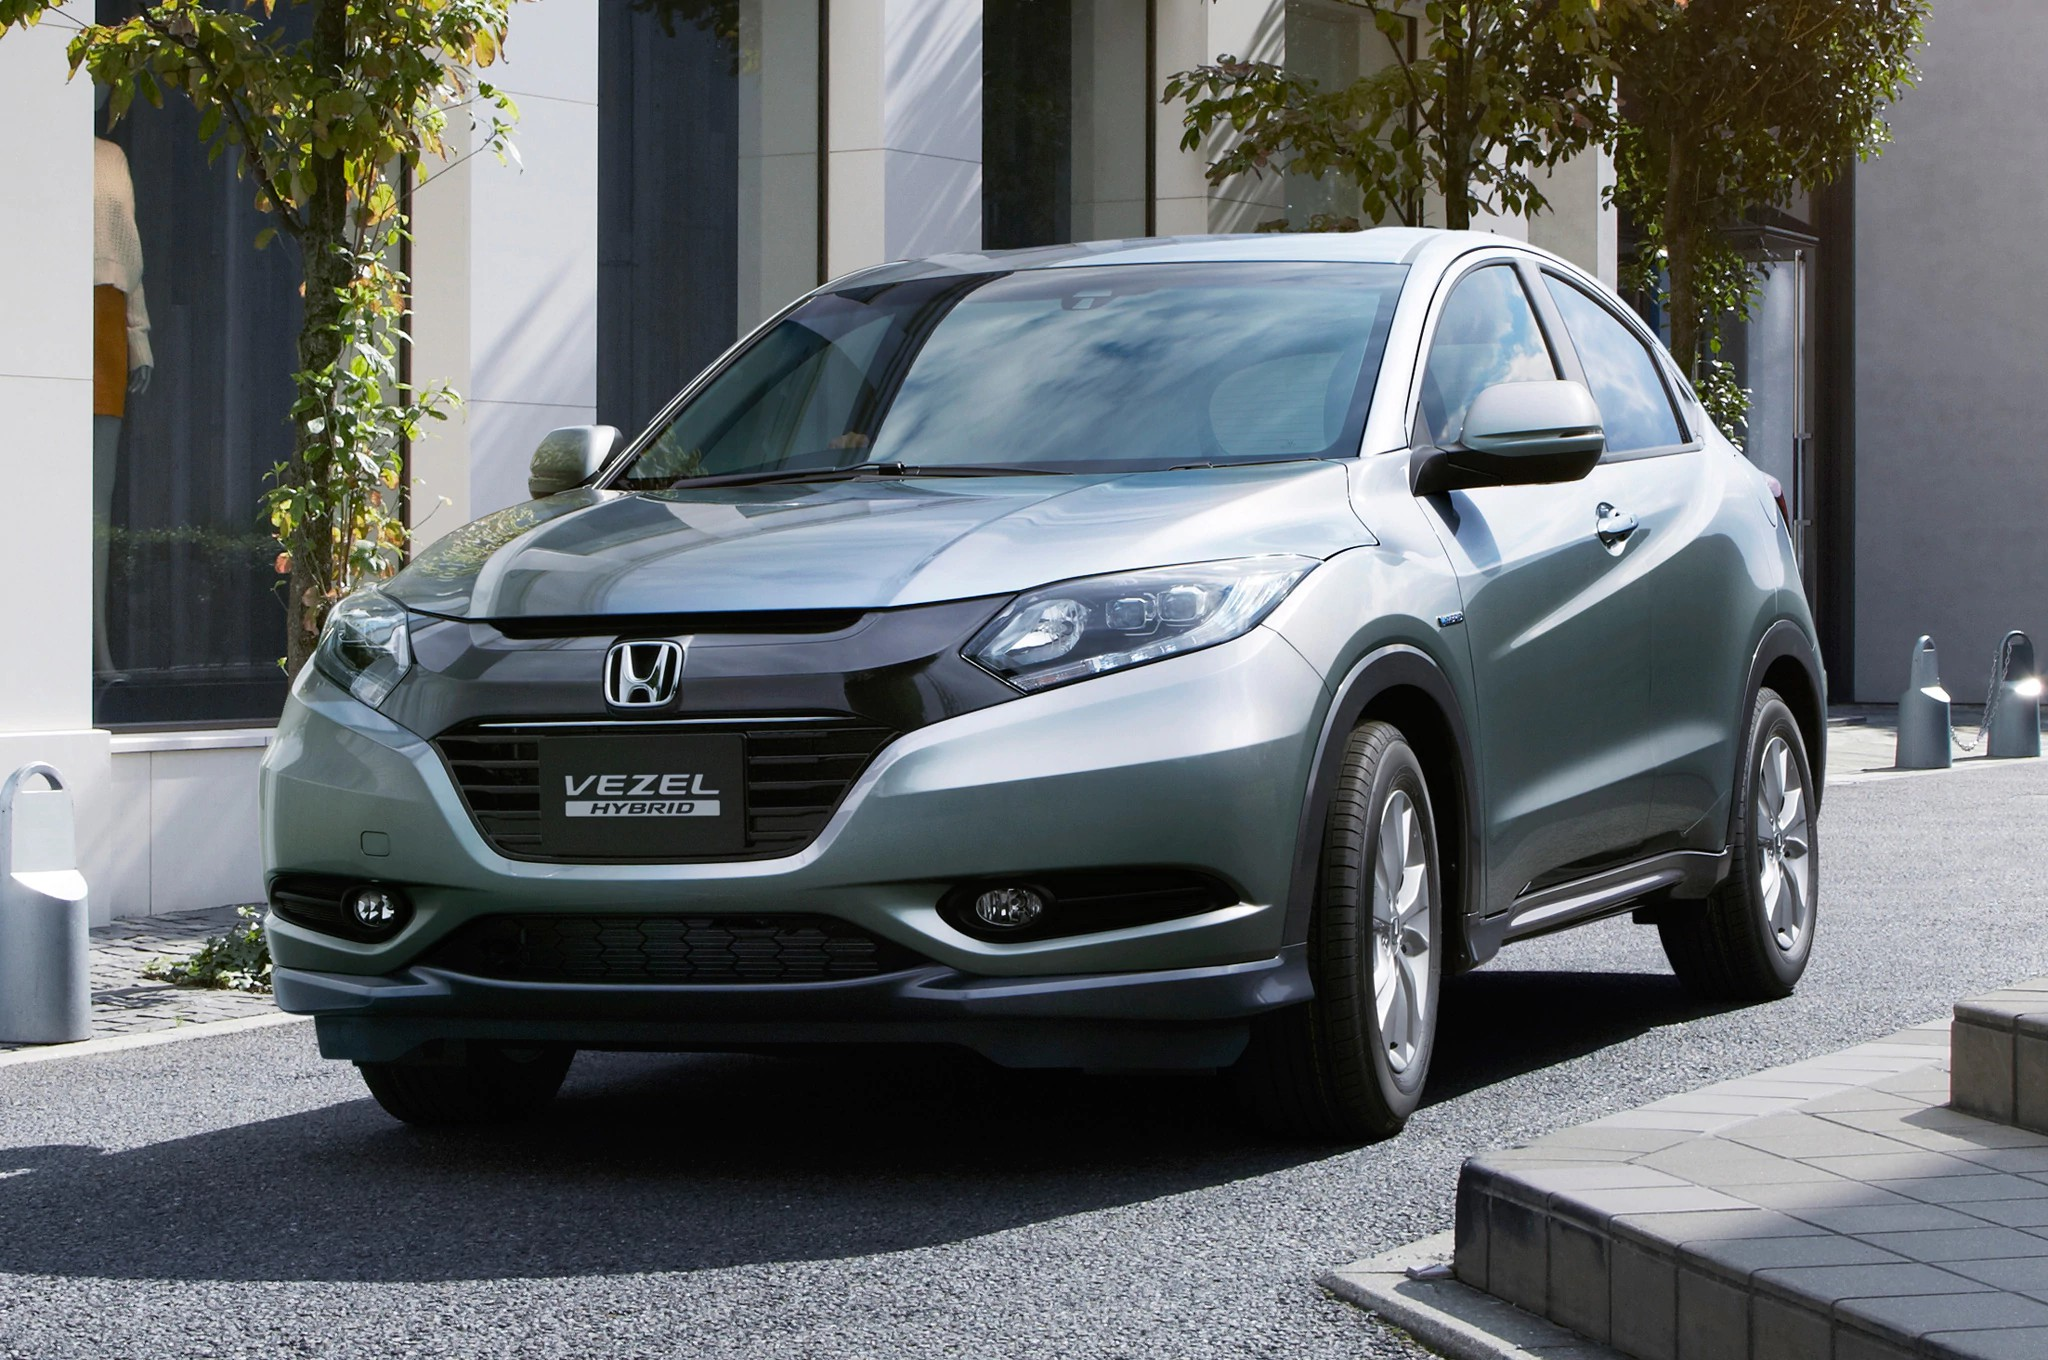 2015-Honda-Vezel-Fit-Crossover-front-view.jpg